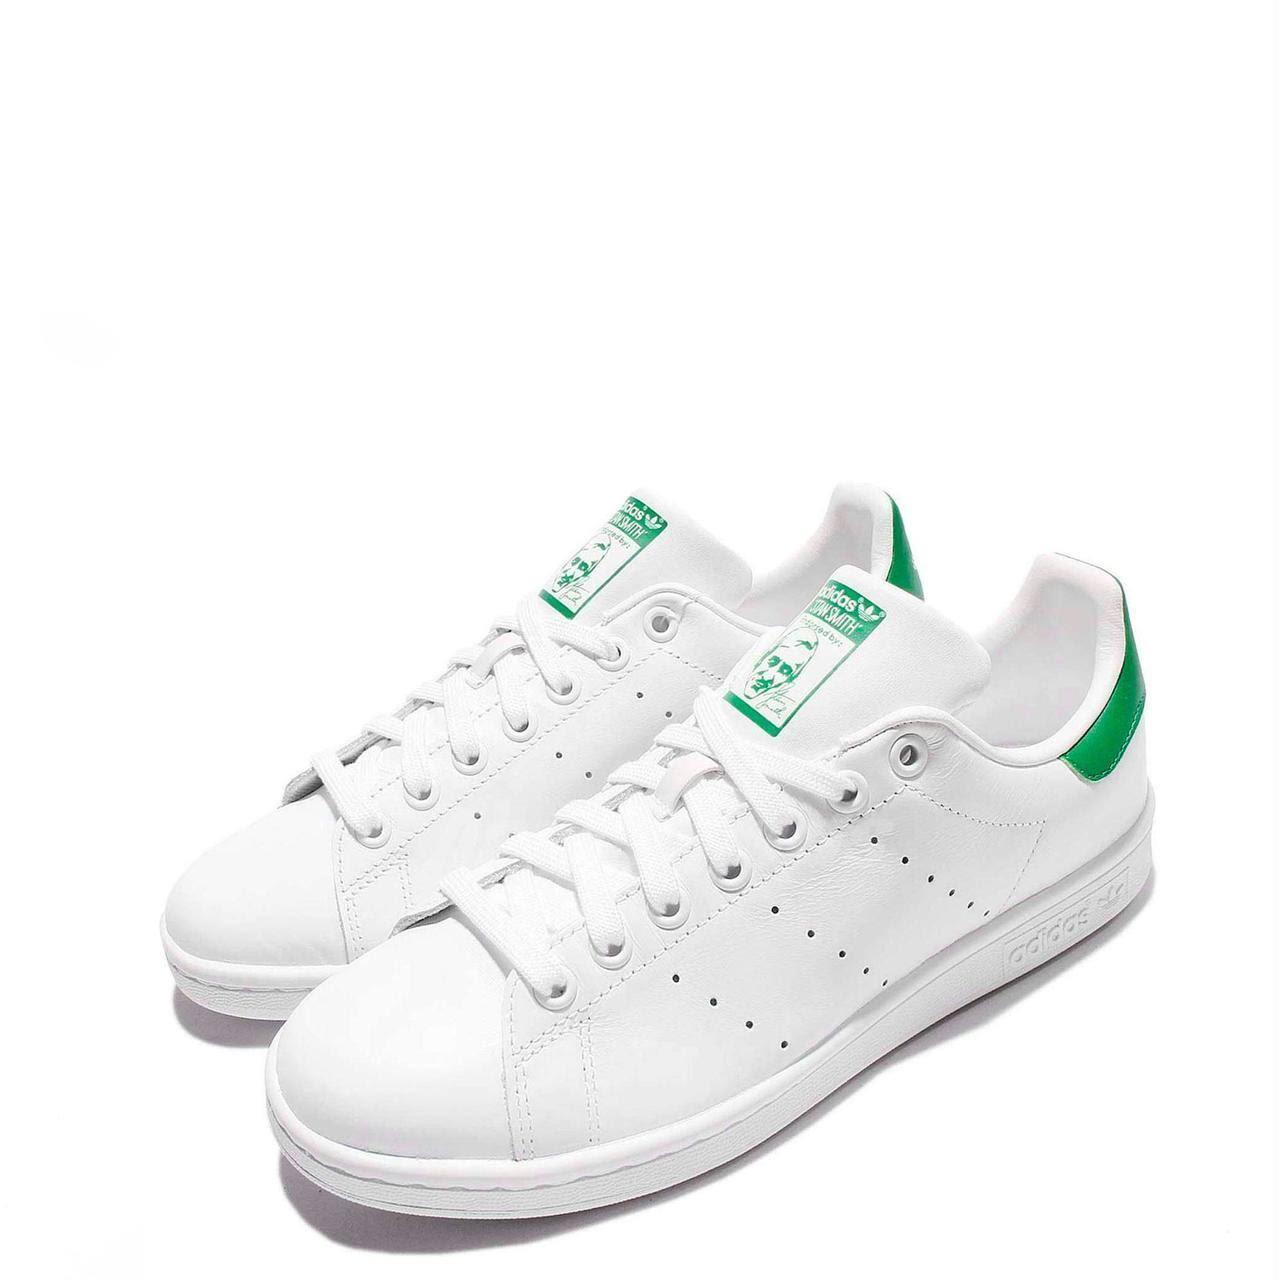 Stan Cloudwhite Smith Y Verde Blanco Hombre Green Corewhite Zapatos Originals Casuales Adidas RpwqXgFX